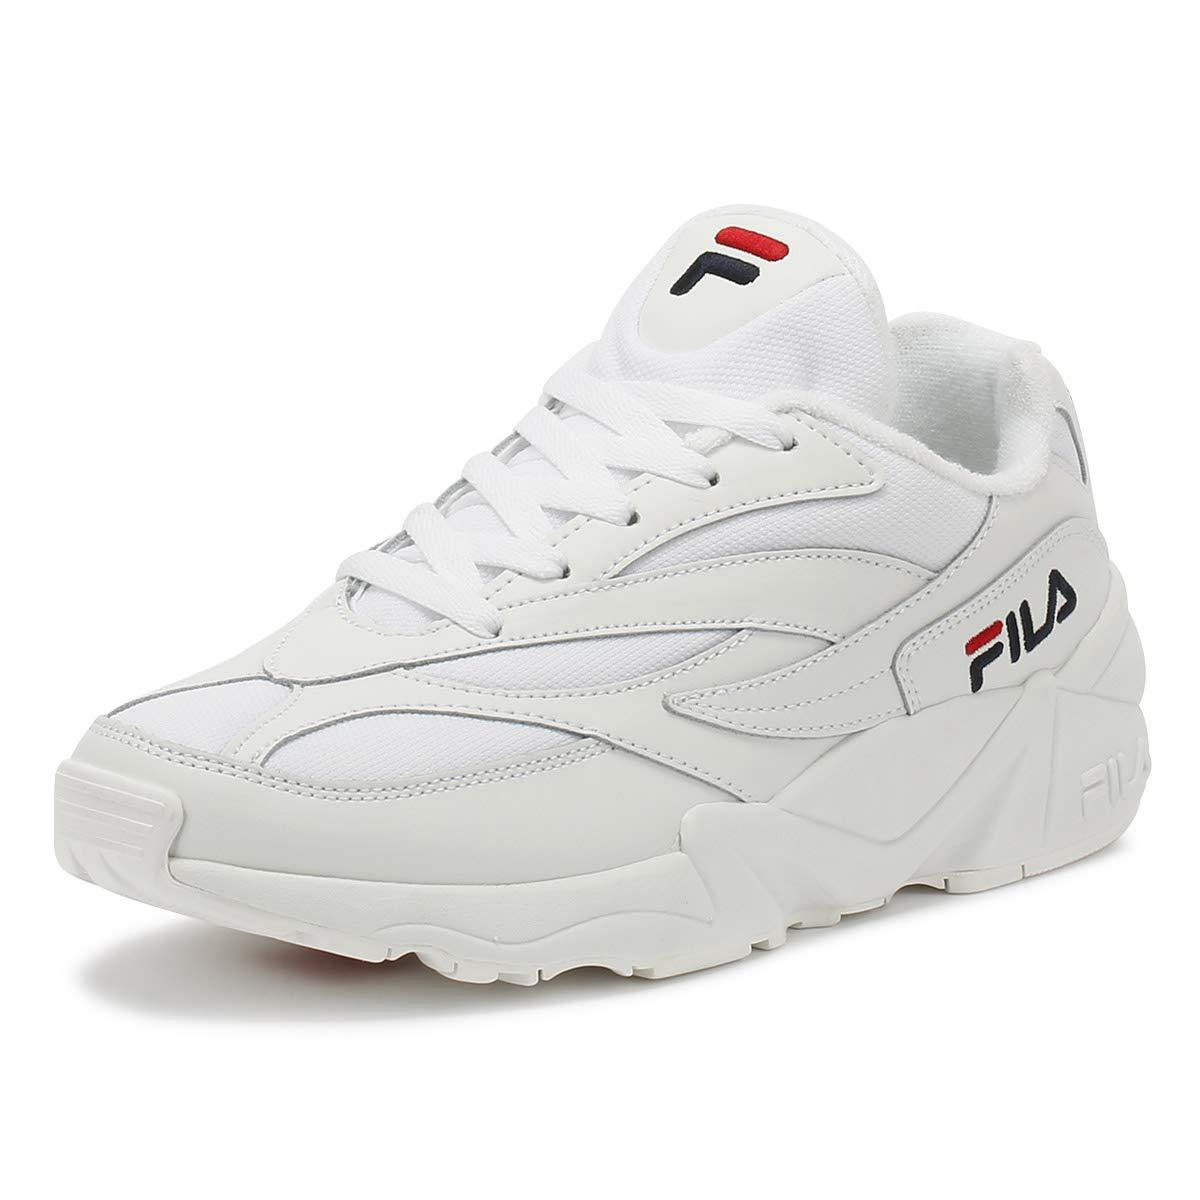 9798d86cb Fila Venom Low Womens White Trainers: Amazon.co.uk: Shoes & Bags